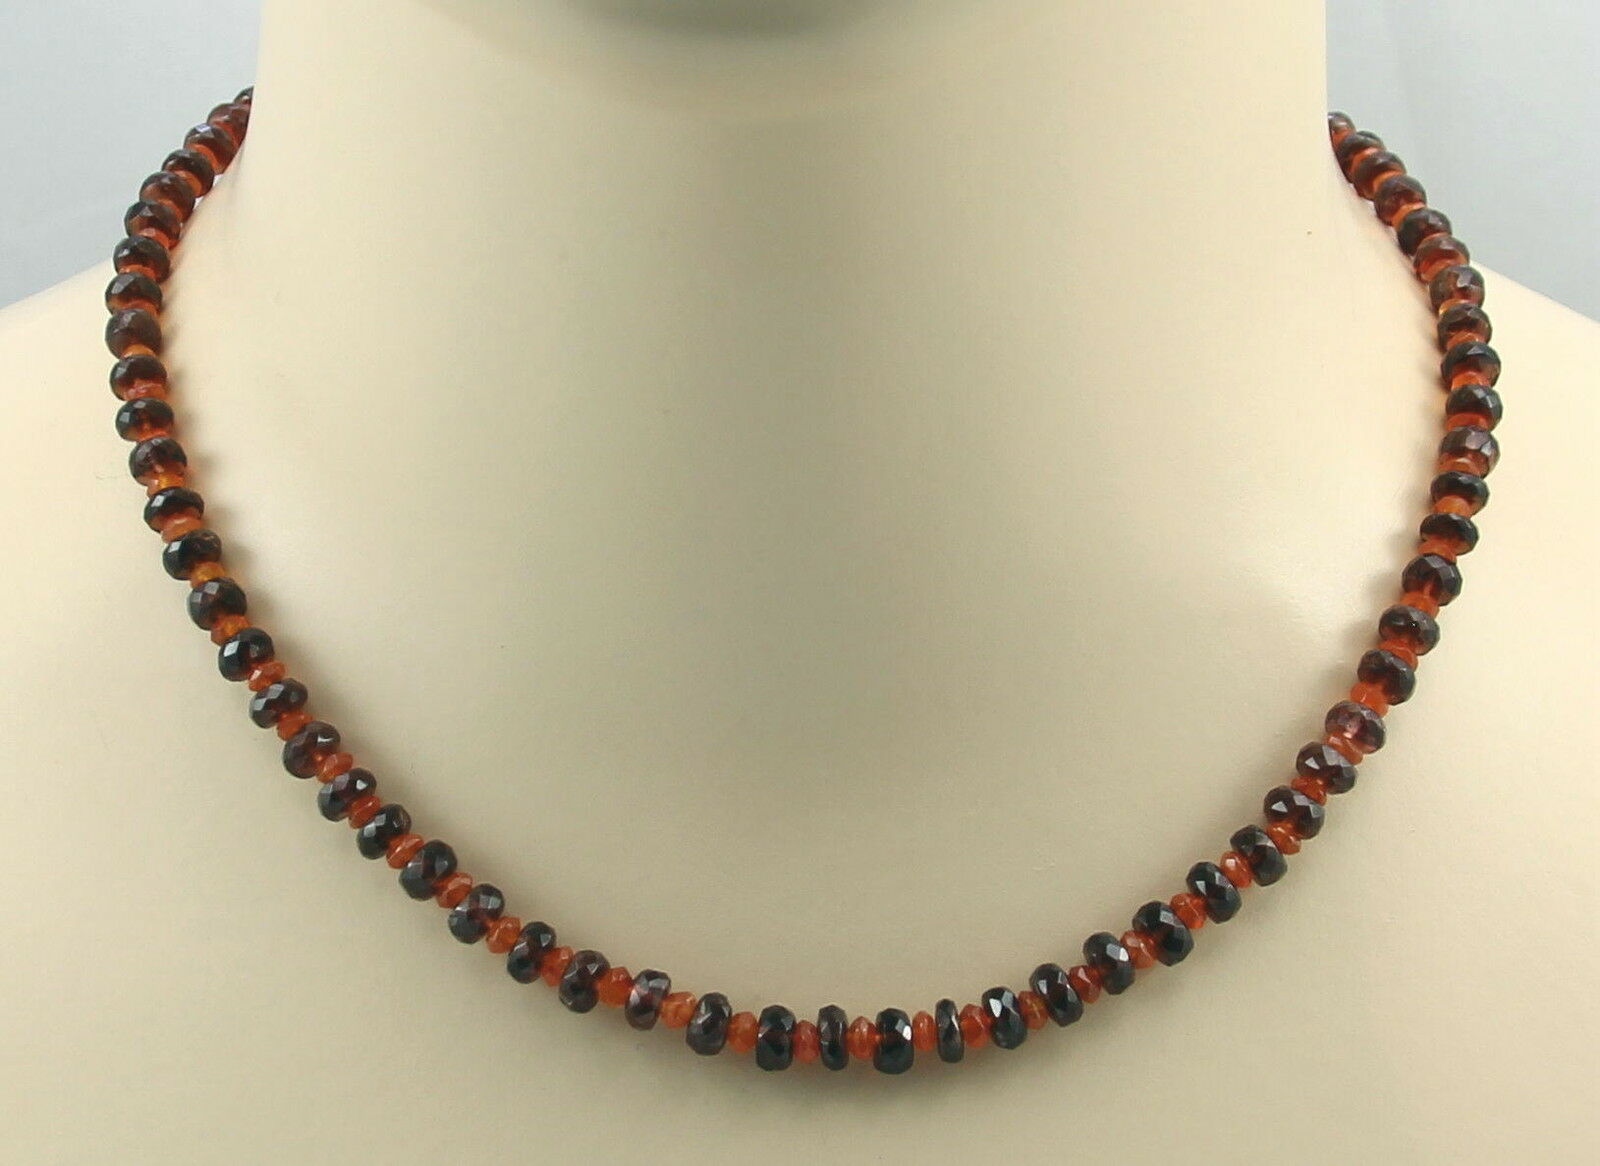 Granat Kette reder Granat mit Karneol Halskette 45 cm lang - Gemini Gemstones